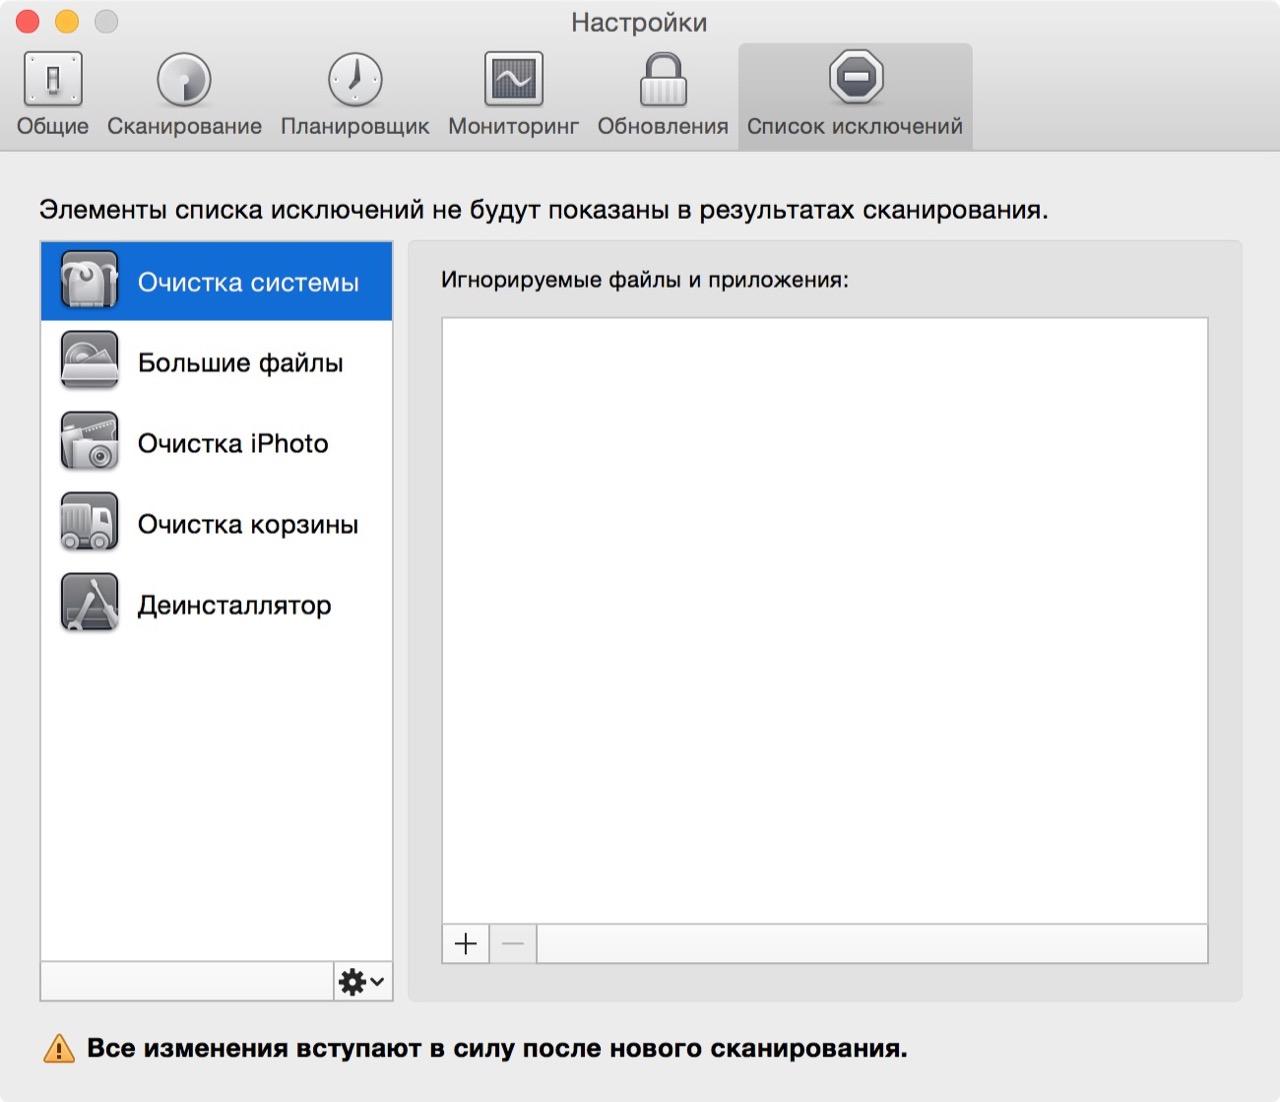 Настройка списка исключений в CleanMyMac 2